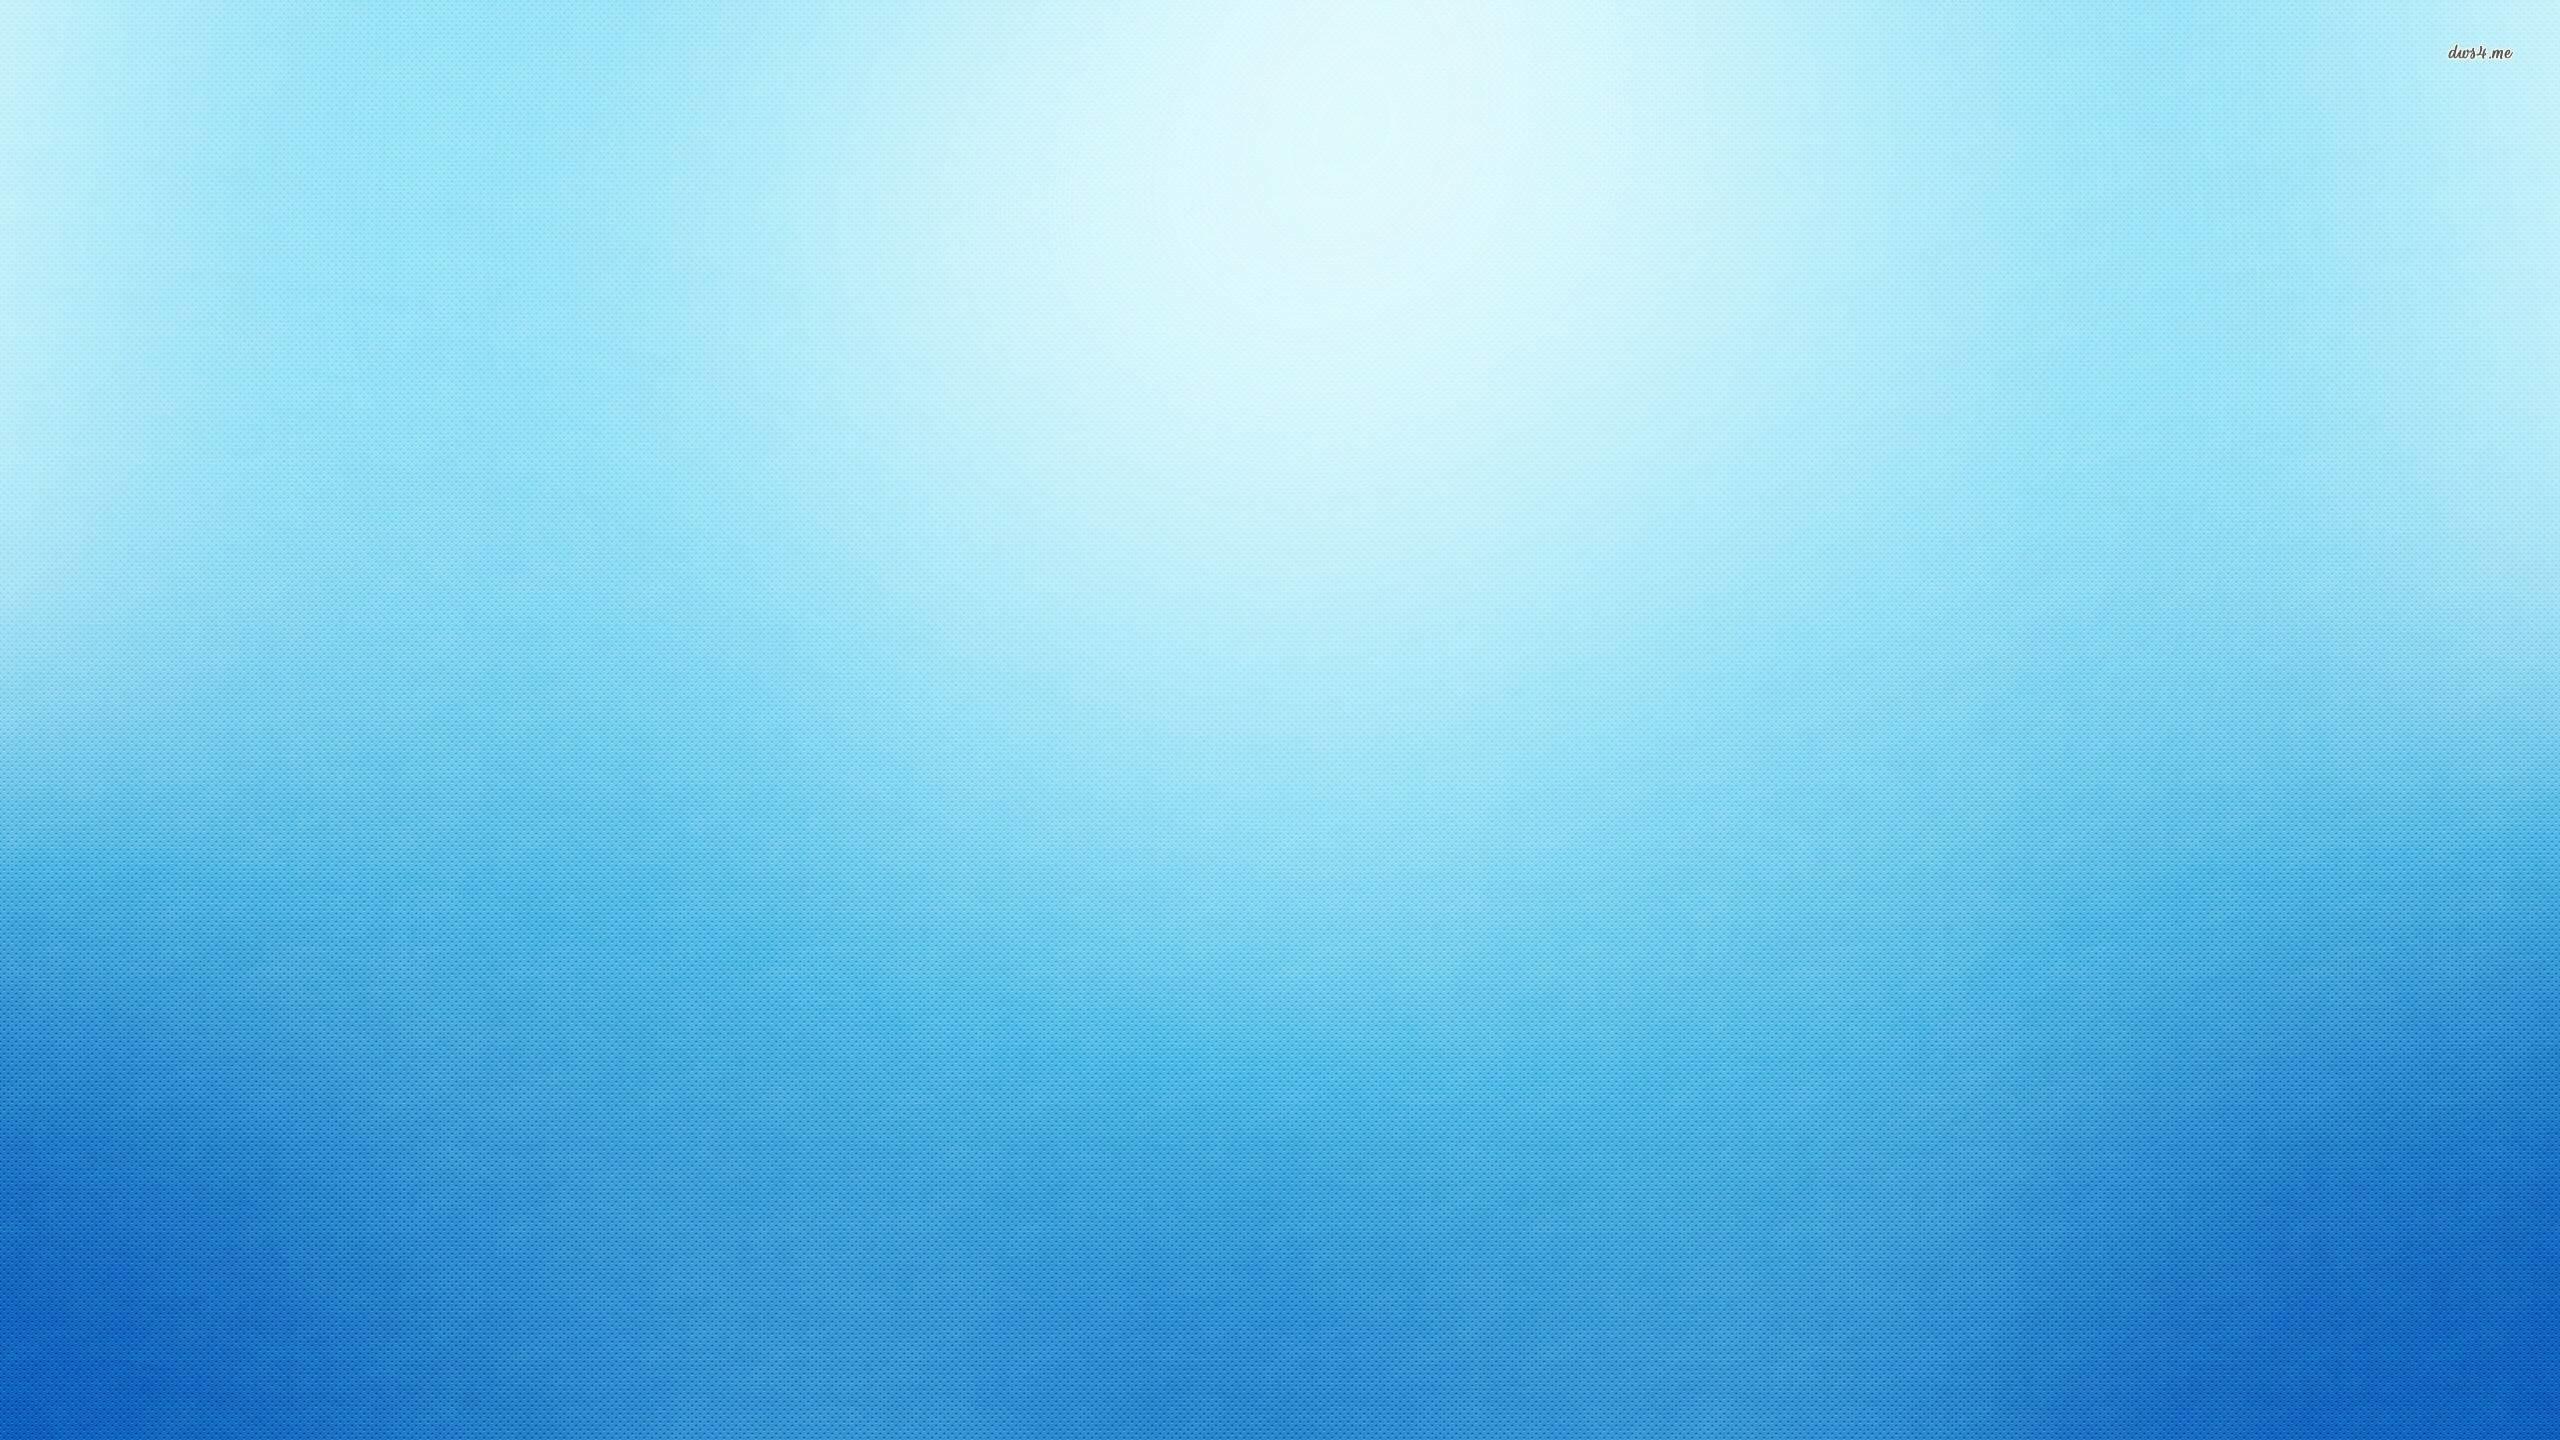 blue back round